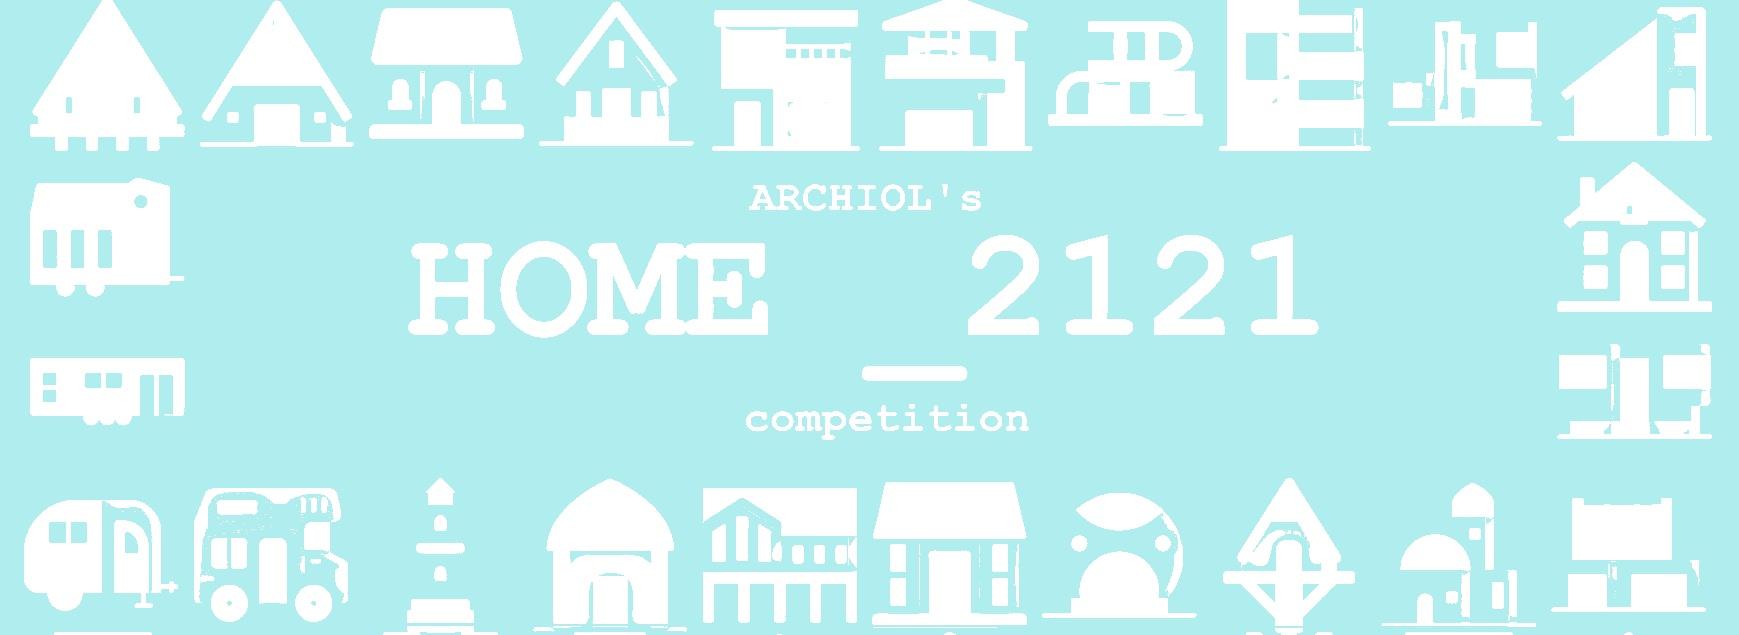 HOME_2121 建筑竞赛